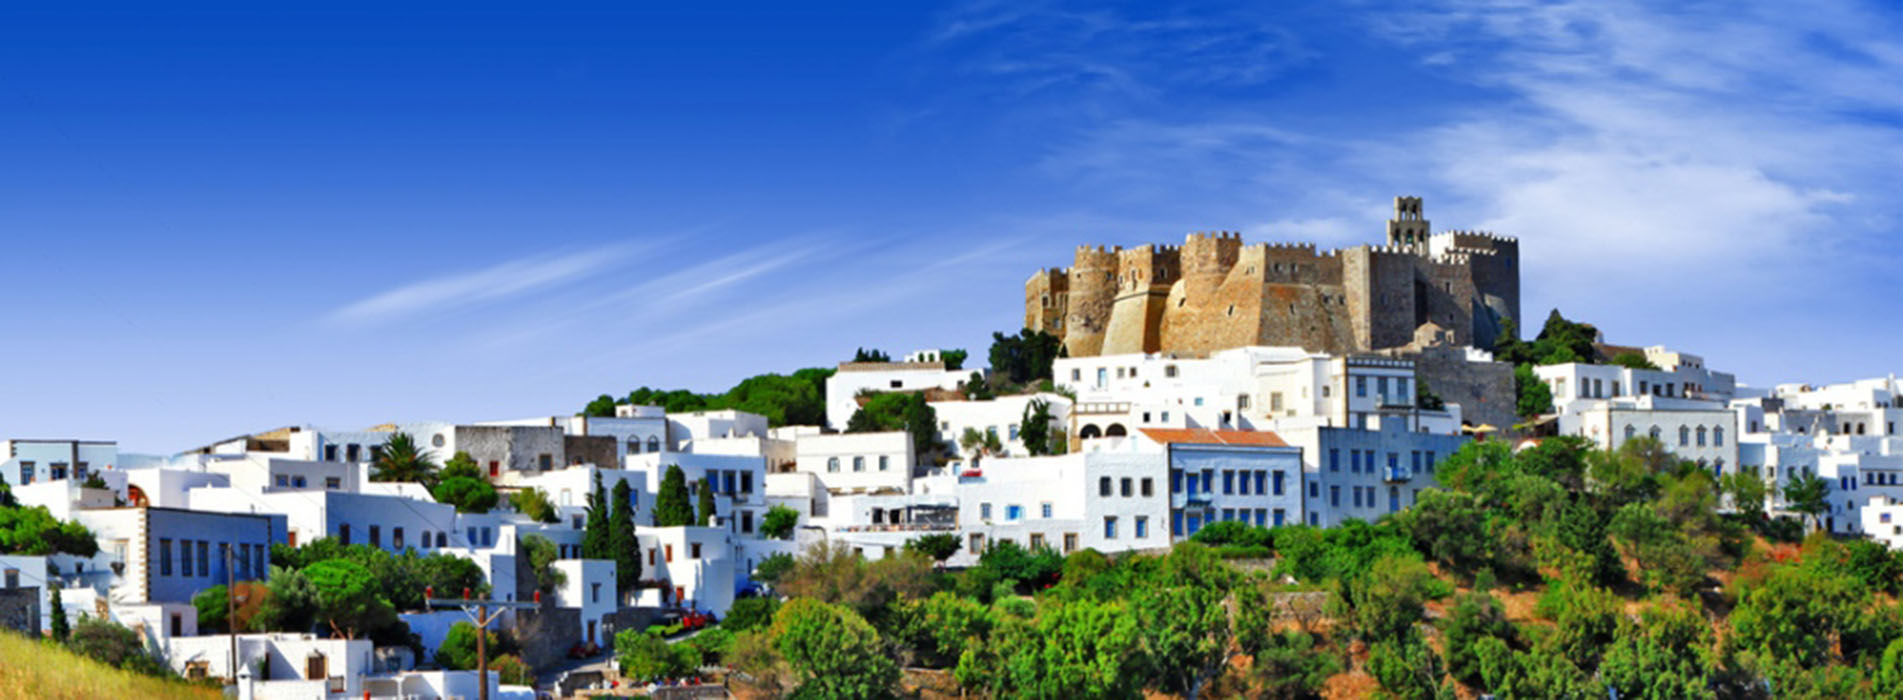 Greece - Patmos 1 (main)